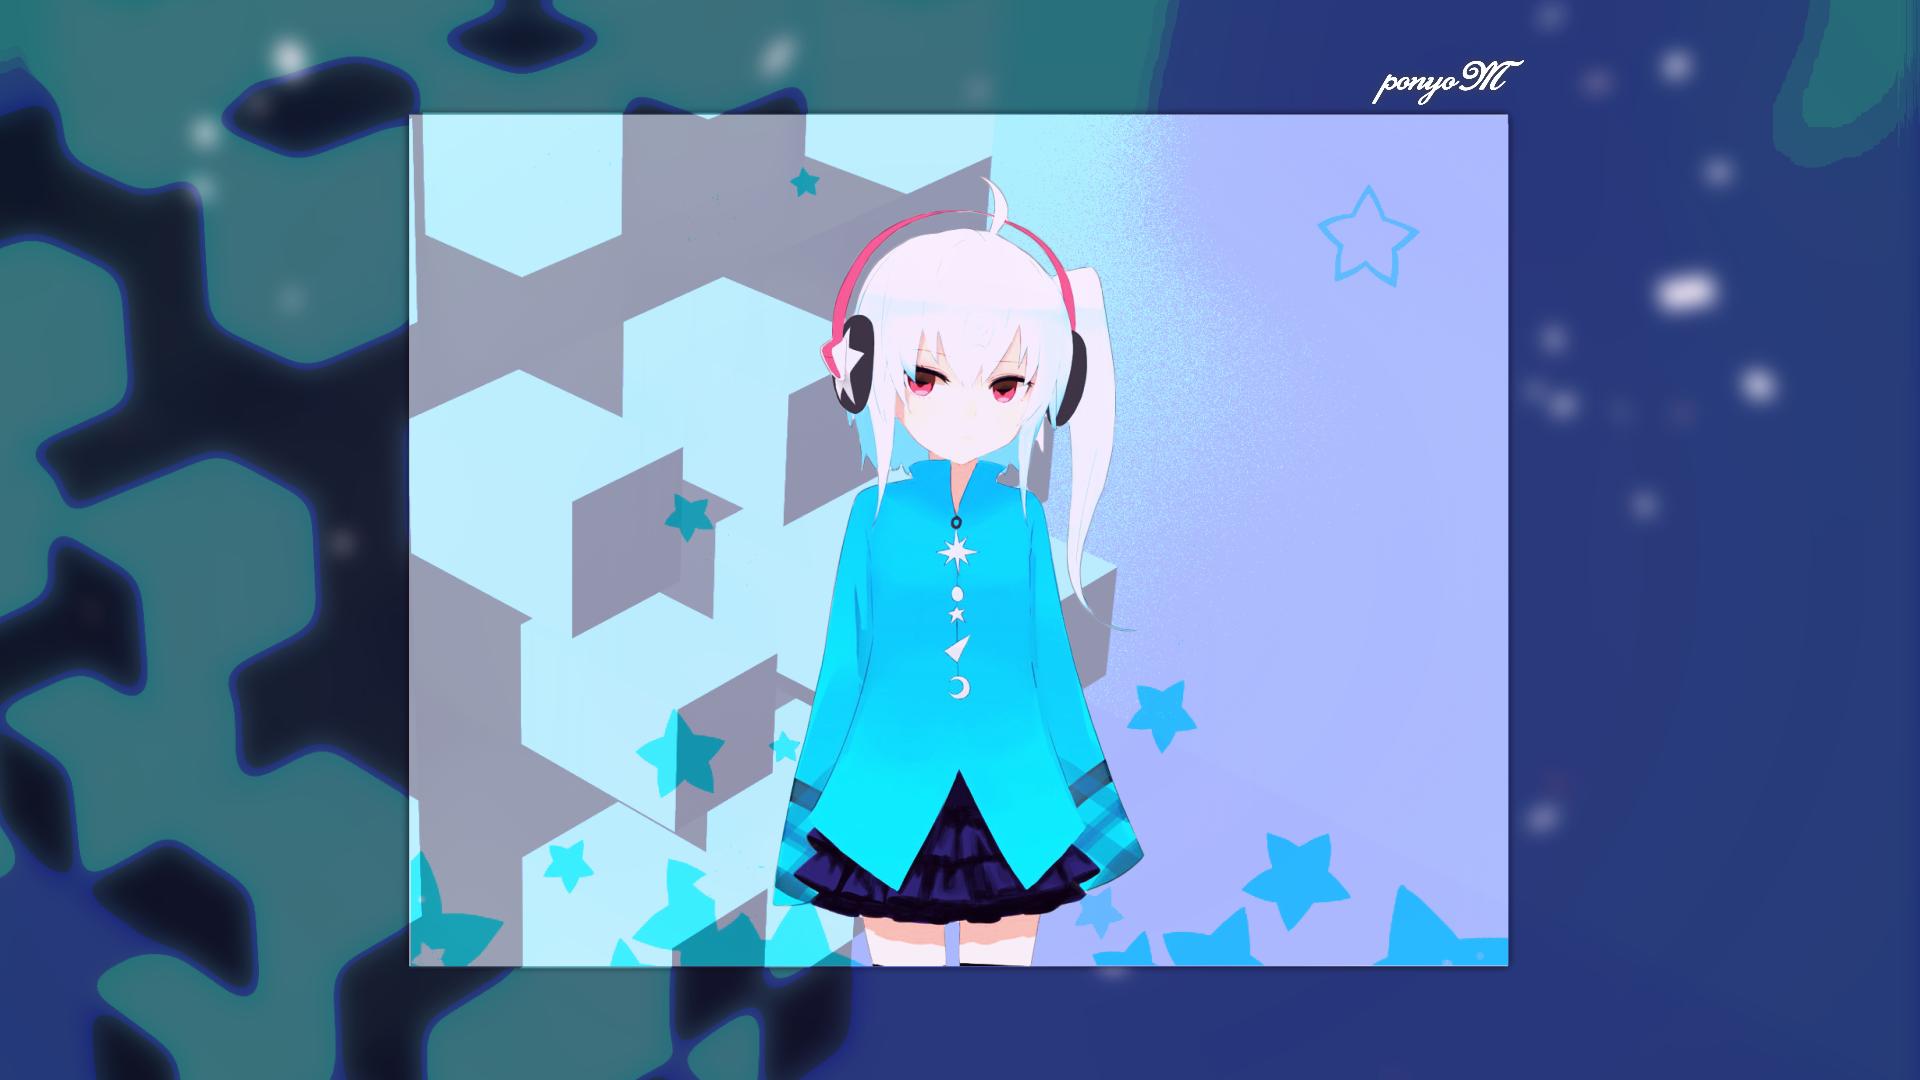 Anime 1920x1080 bilibili anime girls cube simple background artwork